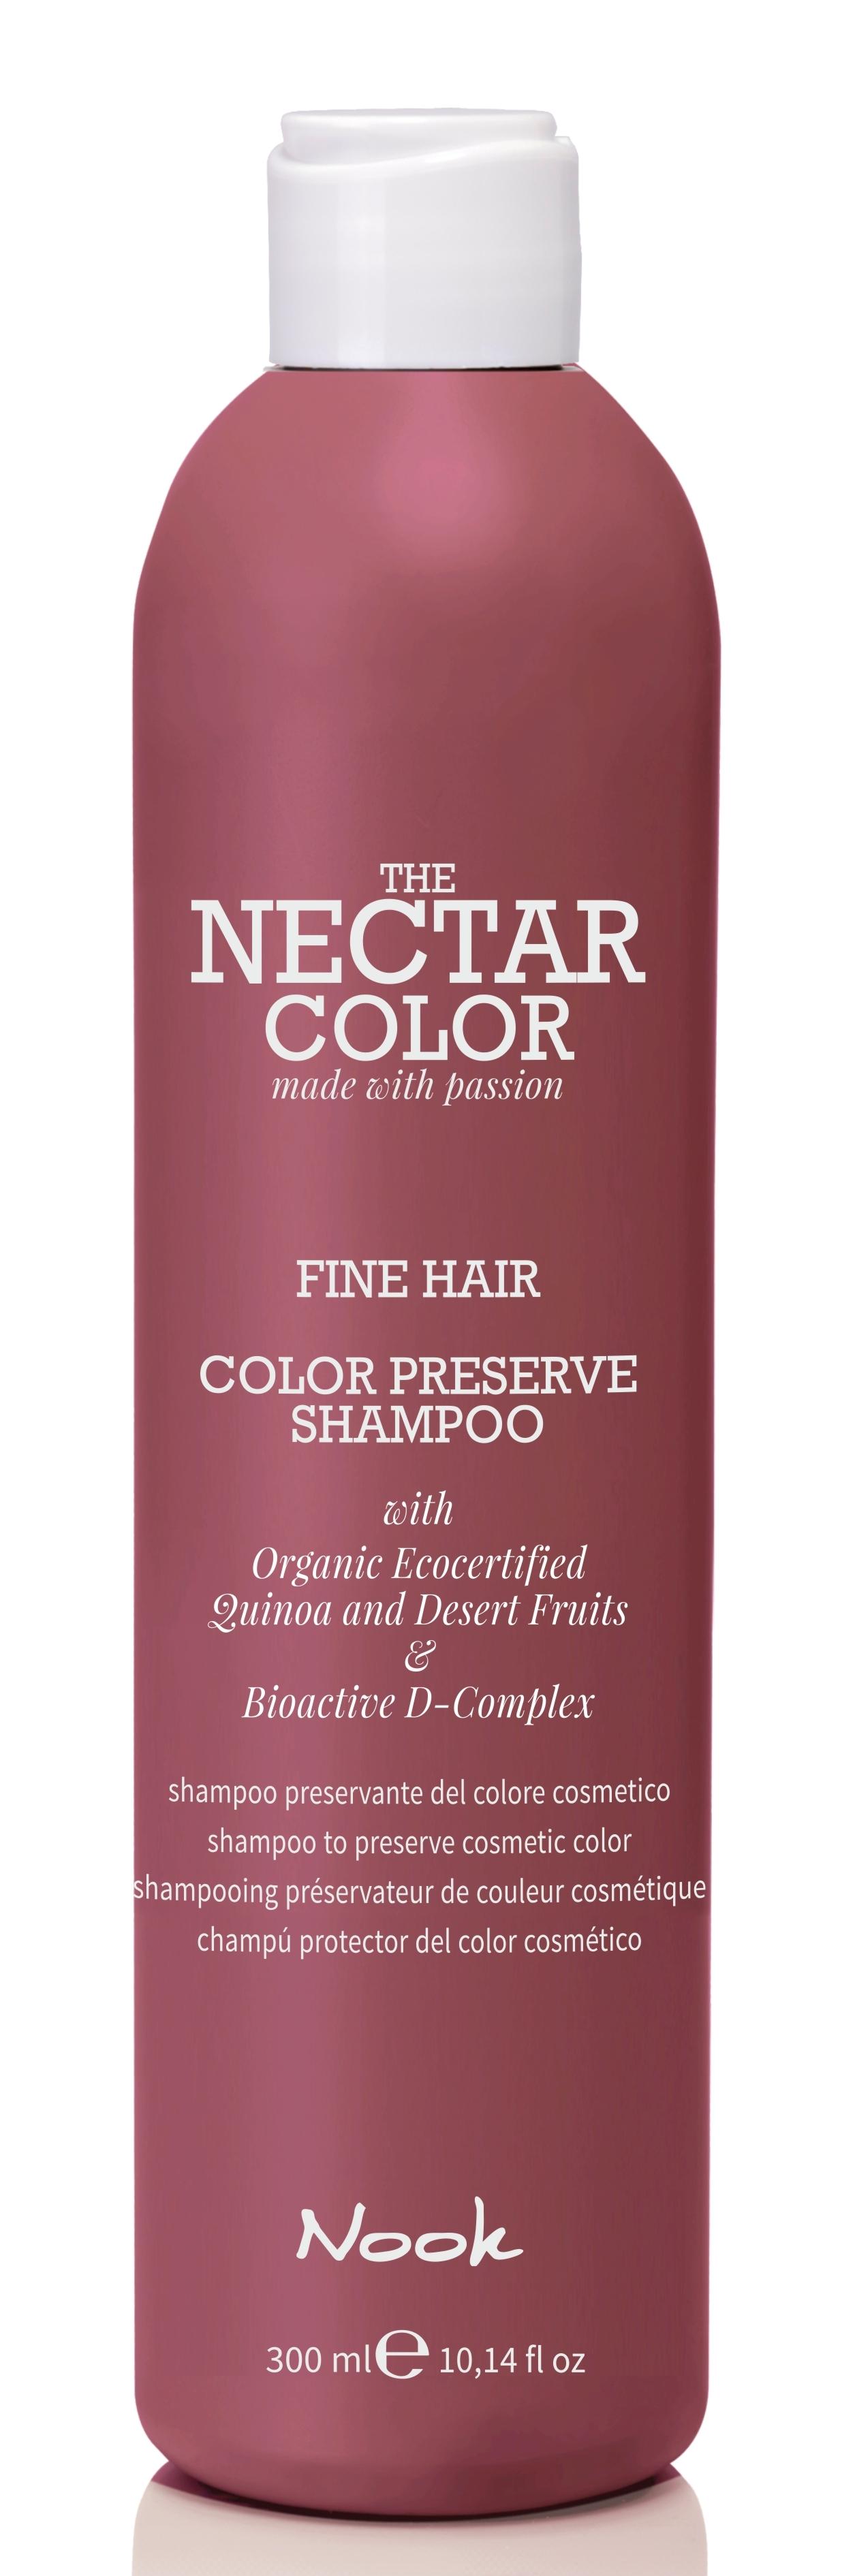 NOOK Шампунь для ухода за тонкими окрашенными волосами / Color Preserve Shampoo - Fine Hair to preserve cosmetic color 300 мл фото